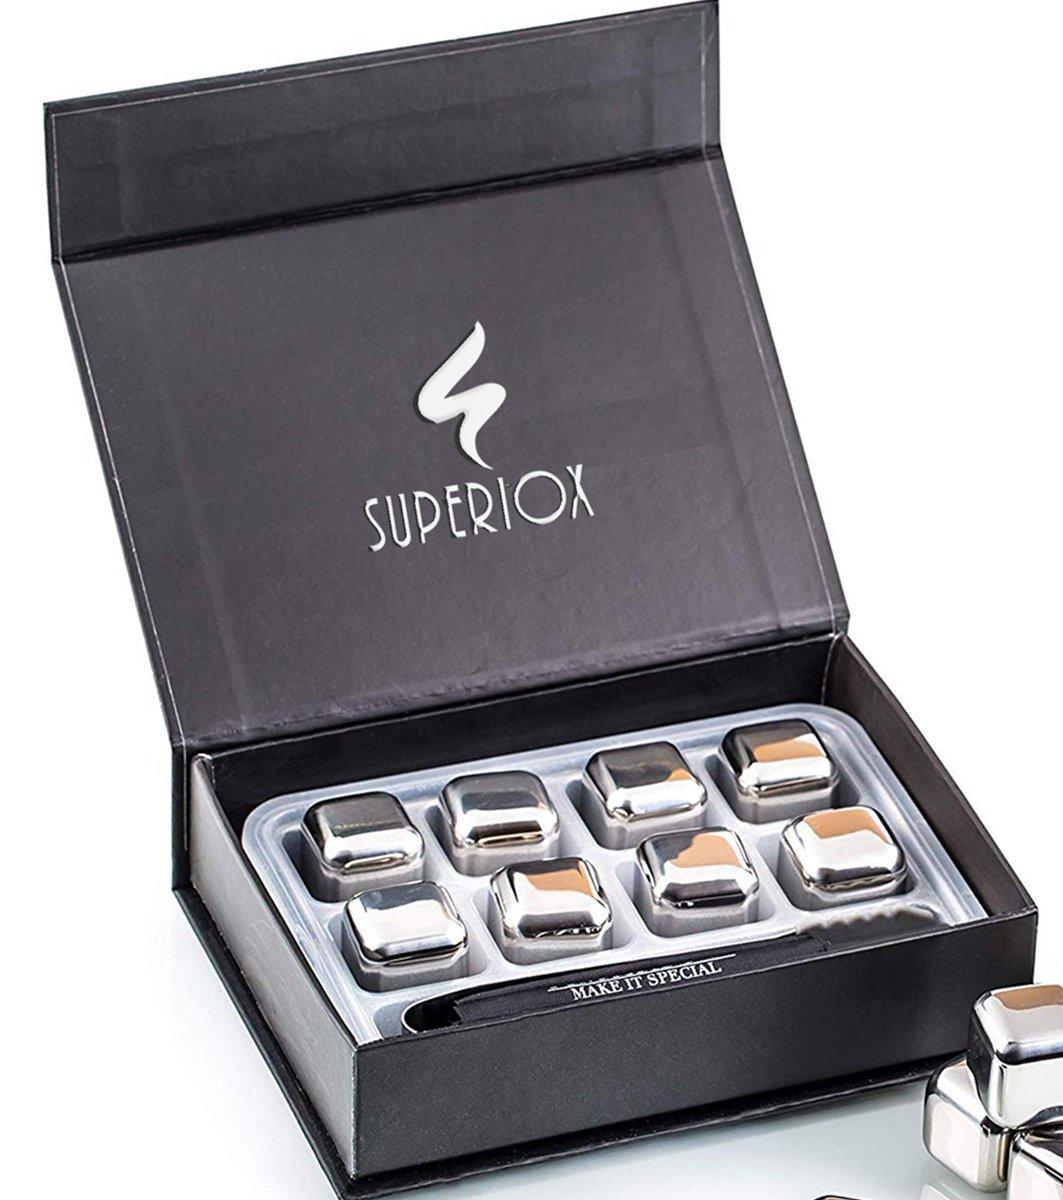 Whiskeystones Set - Luxe Whiskey Stenen 8 stuks - Ijsblokken - RVS - Prachtige Whiskey Cubes Set - Superiox™ kopen